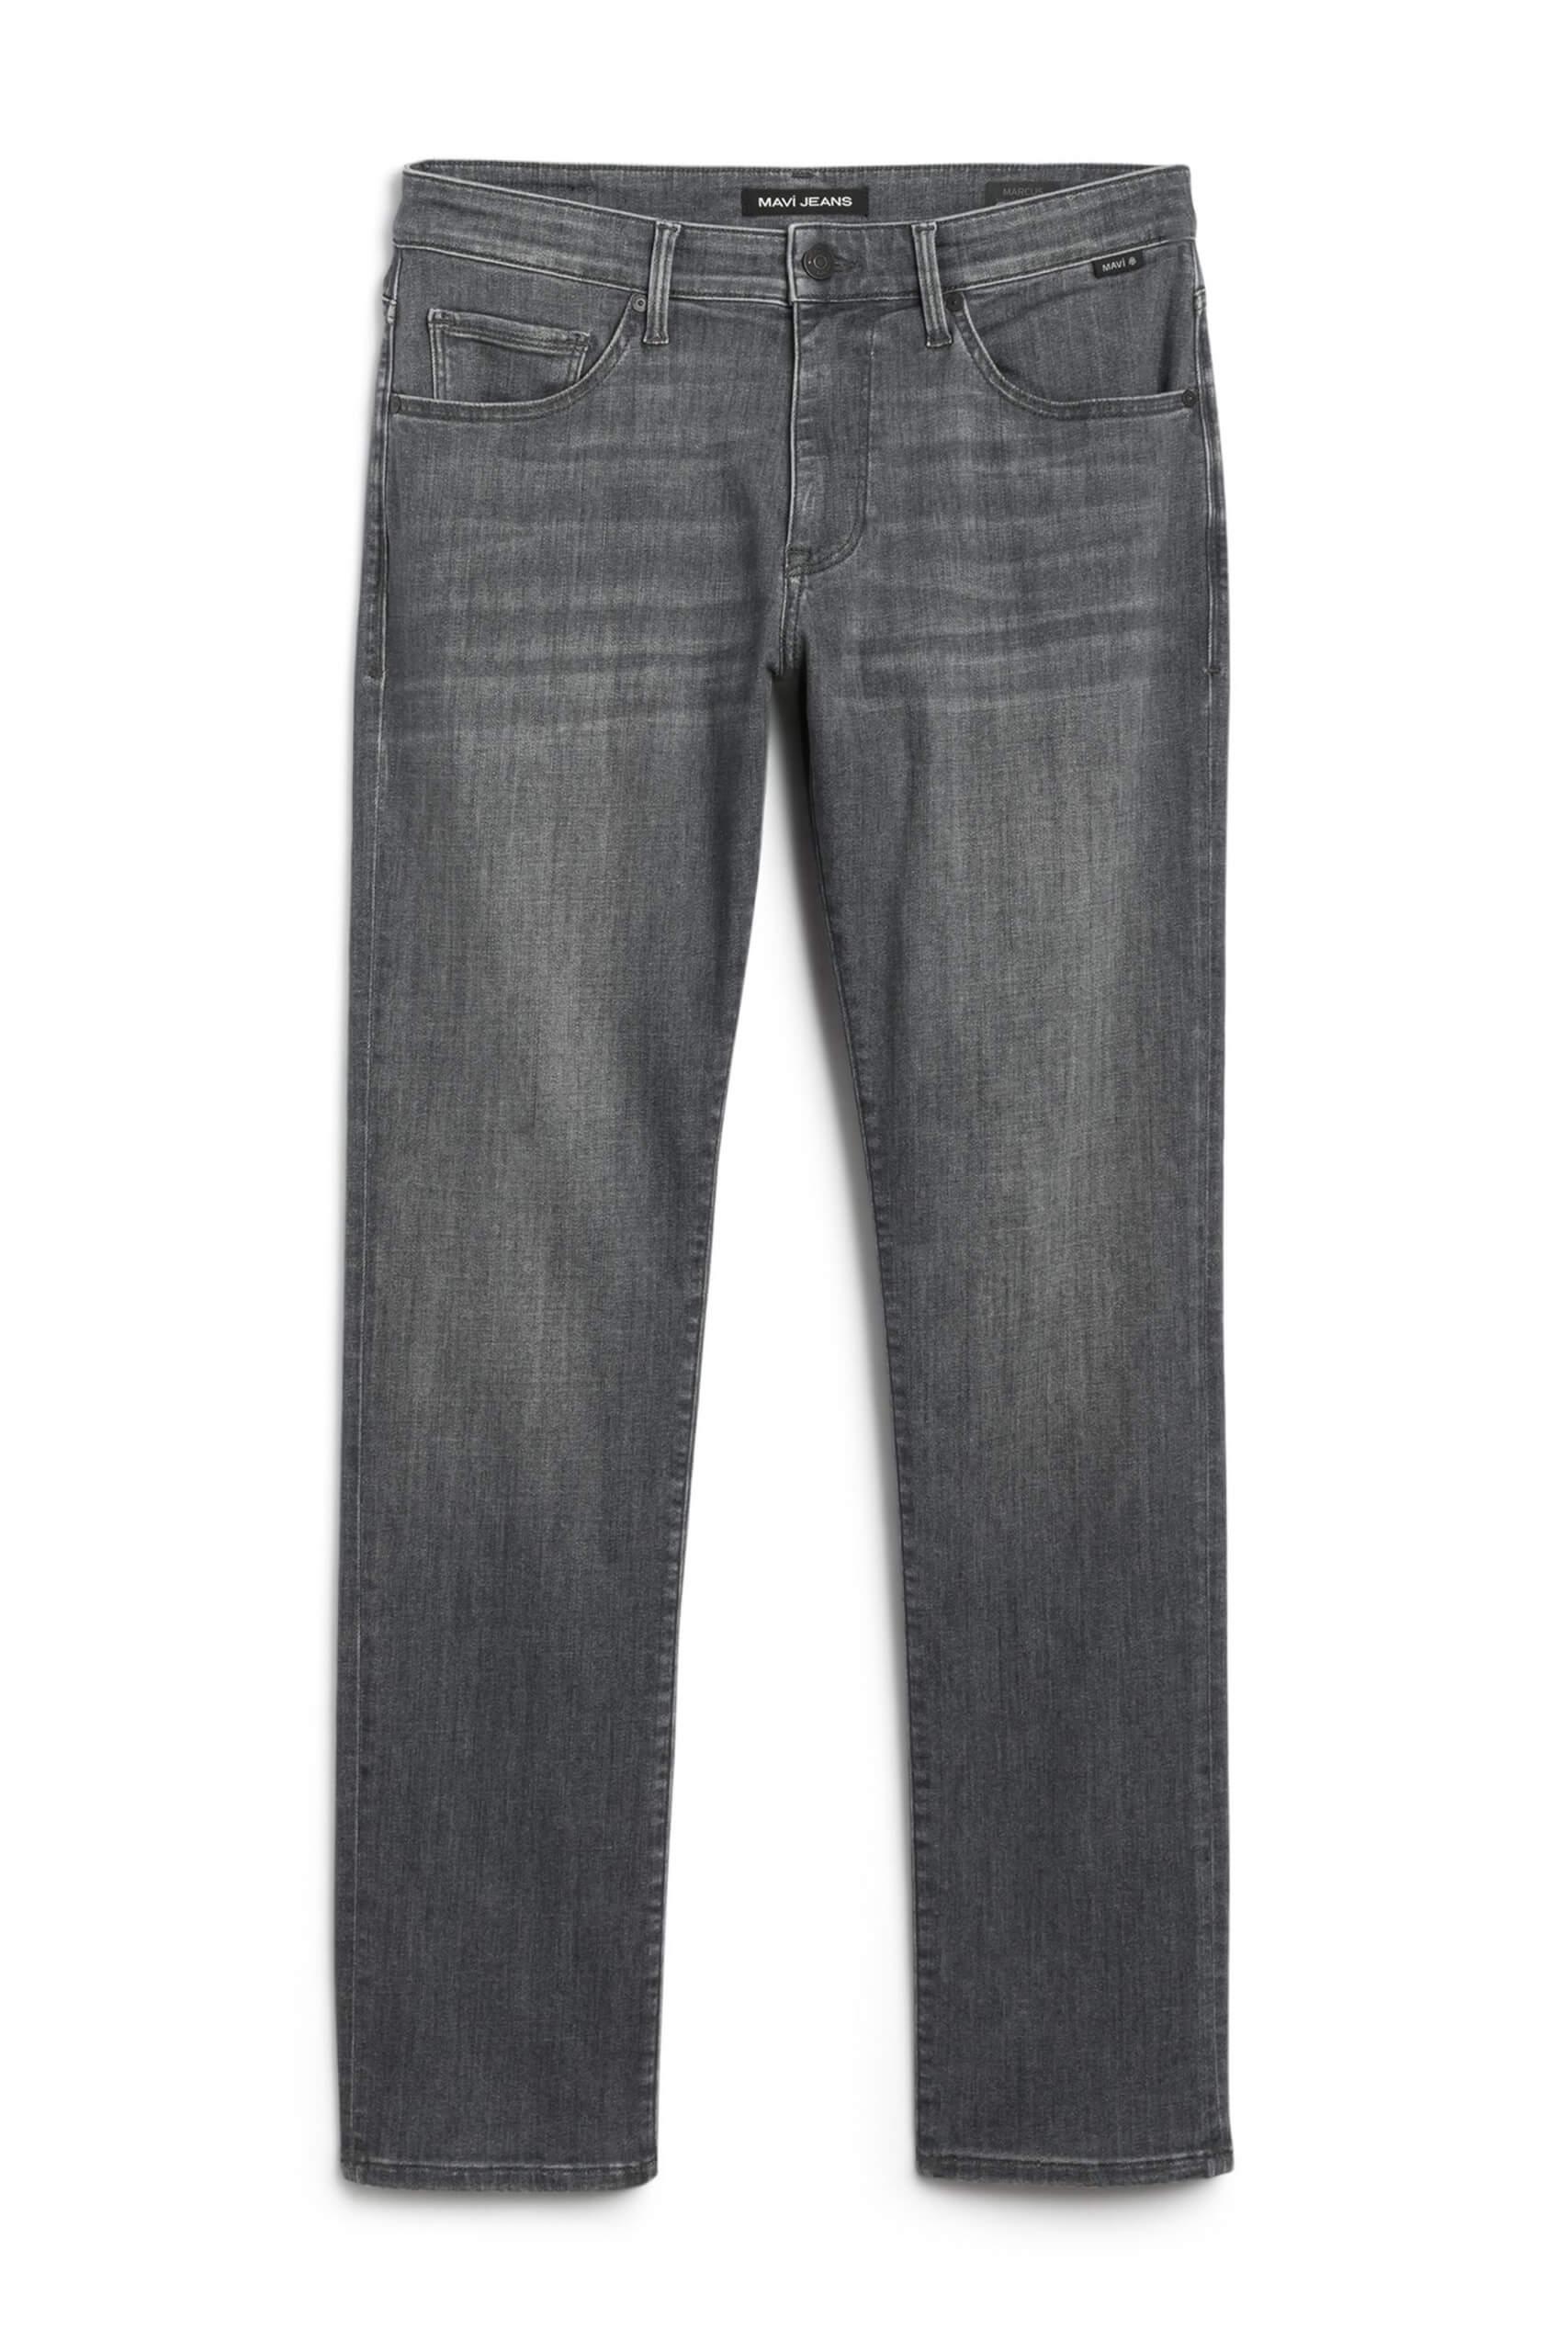 Stitch Fix Men's grey straight leg jeans.